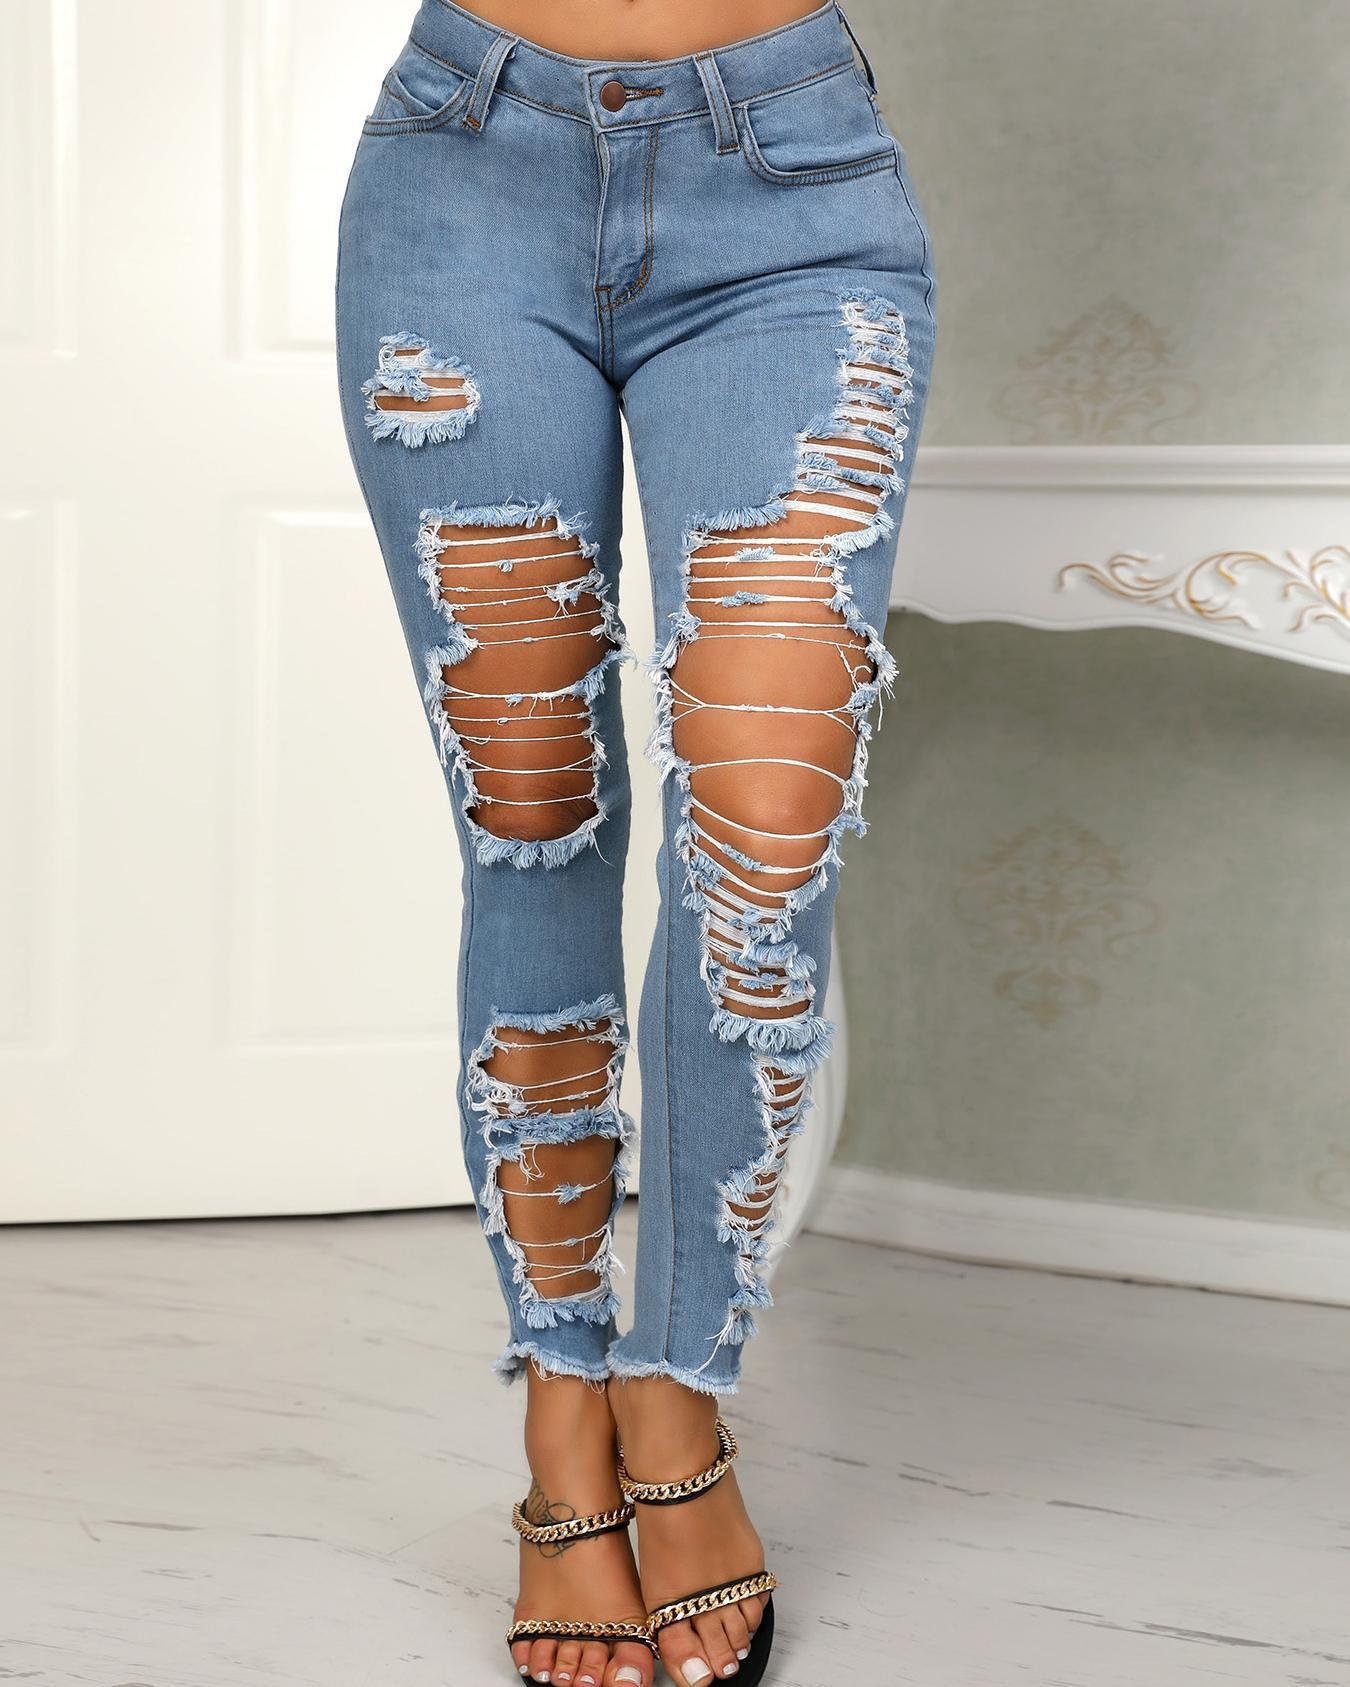 chicme / Holey Frayed Hem Distressed Pencil Jeans